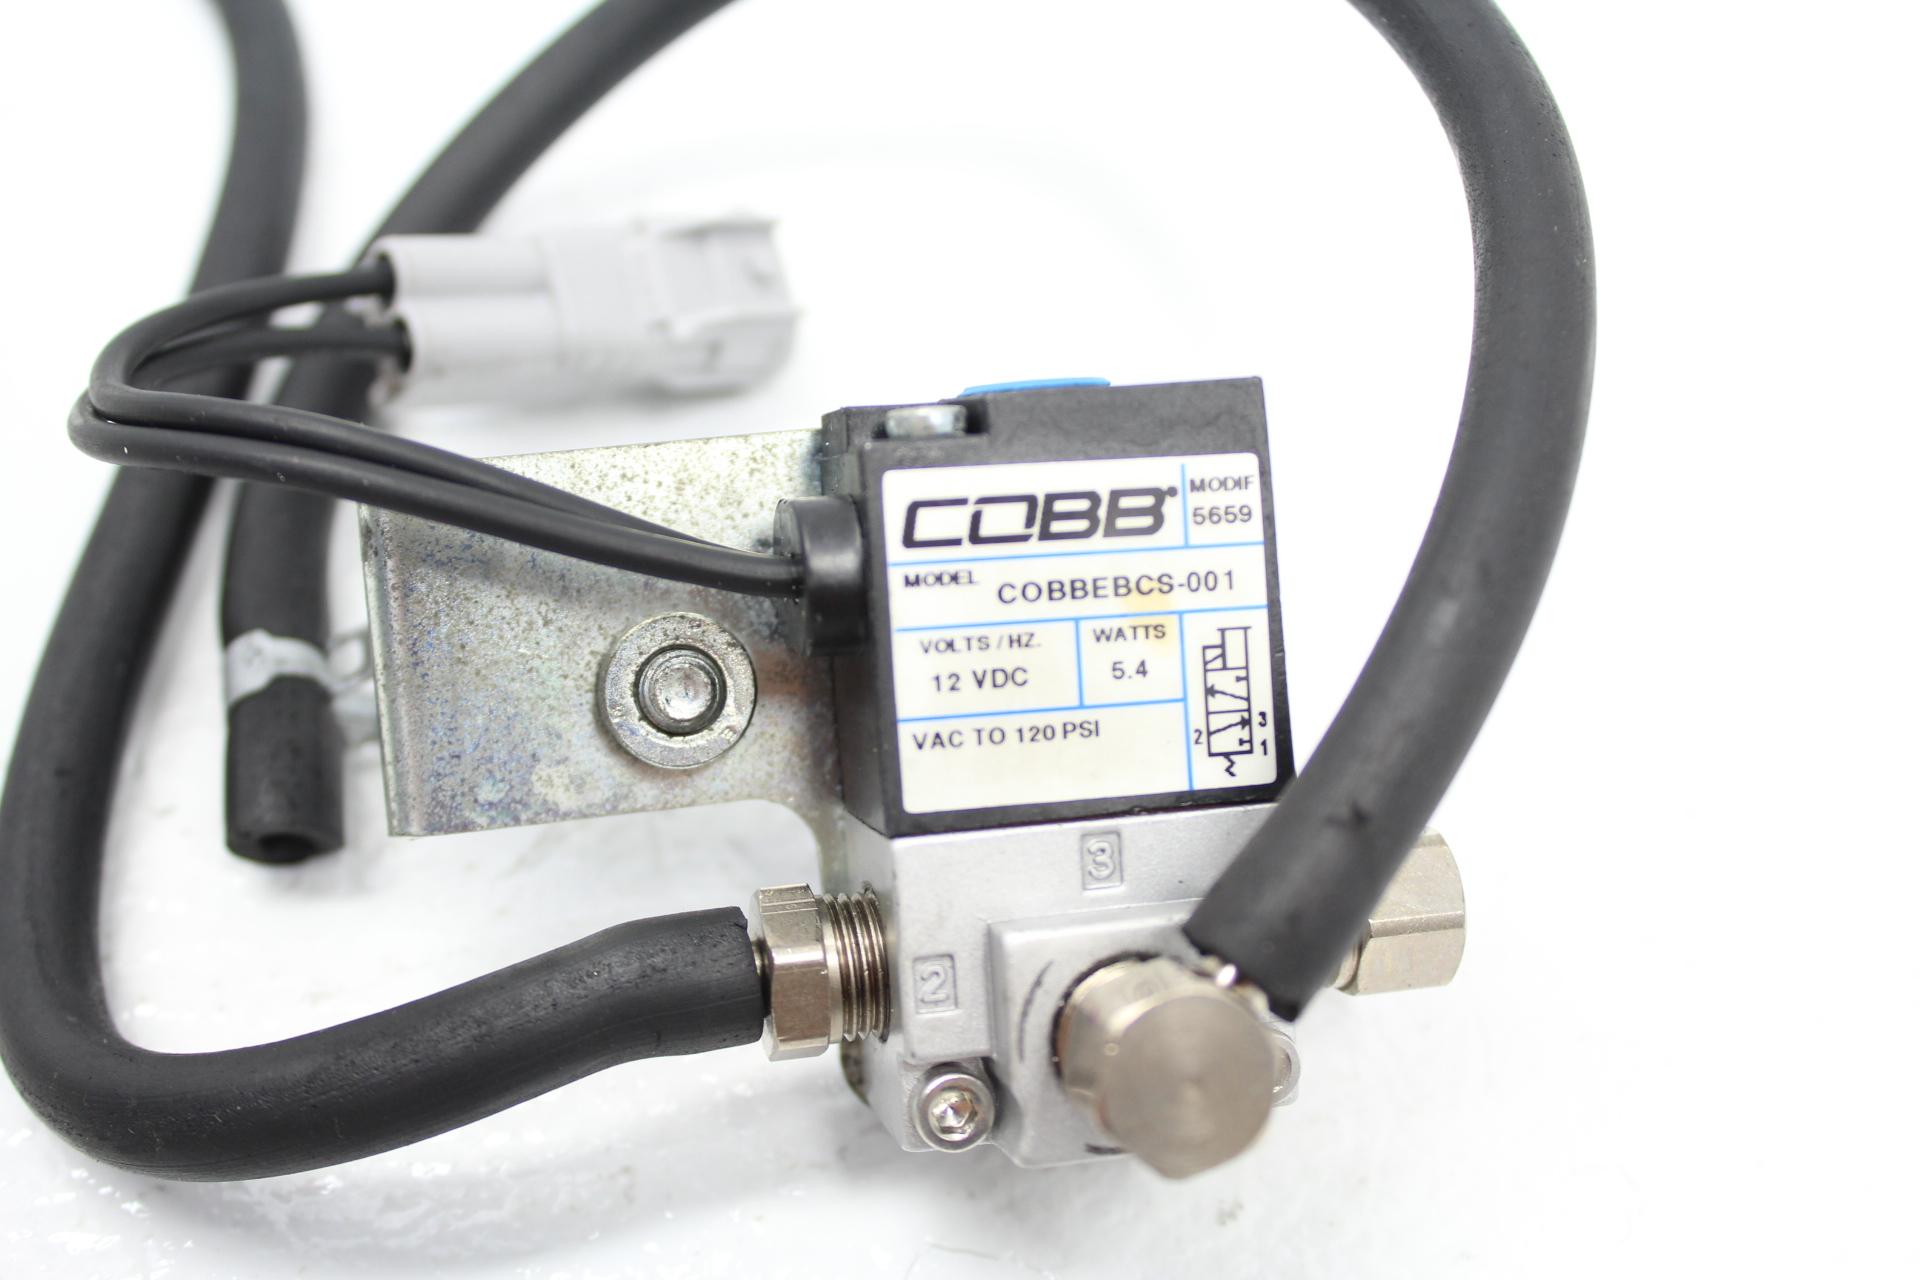 2008-2014 SUBARU WRX & 2008-2019 STI COBB 3-PORT BOOST CONTROL SOLENOID EBCS